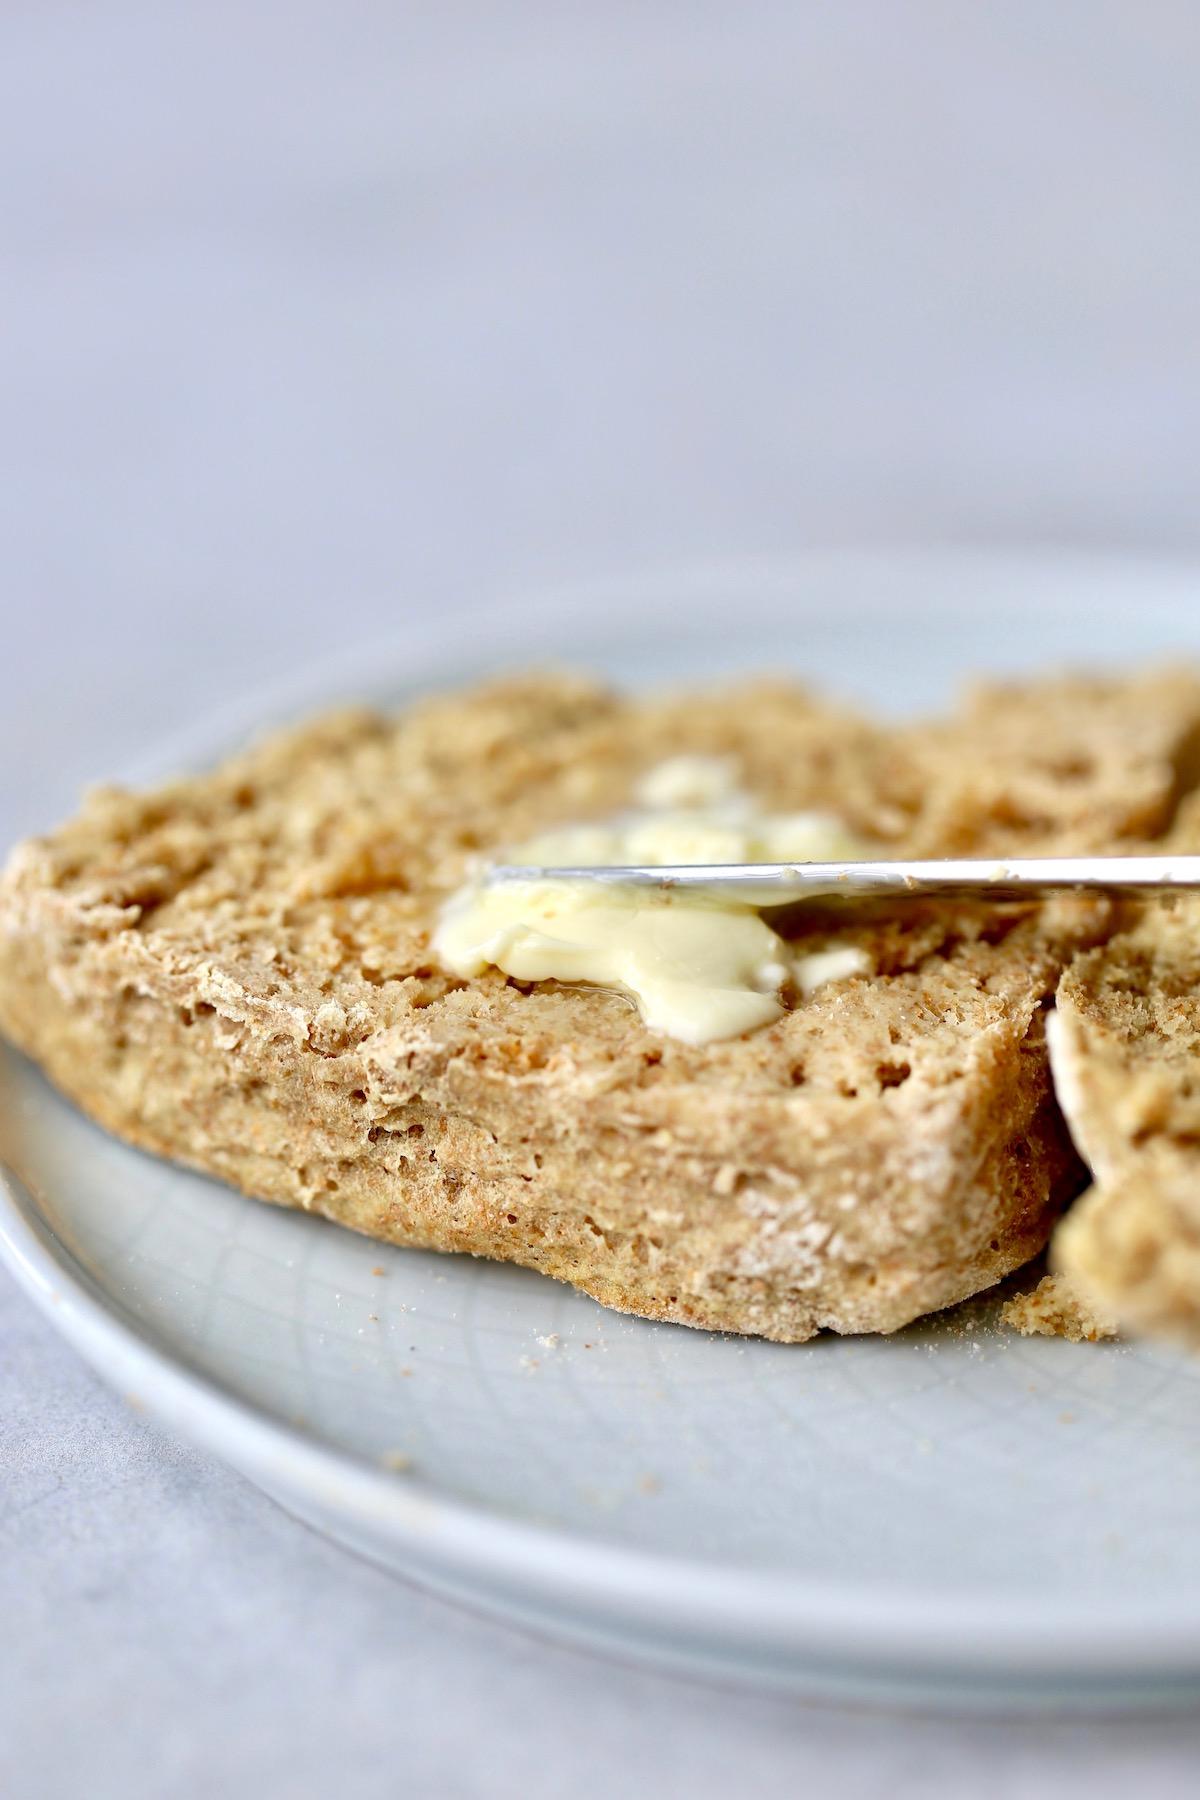 vegan irish soda bread cut in half being smeared with butter